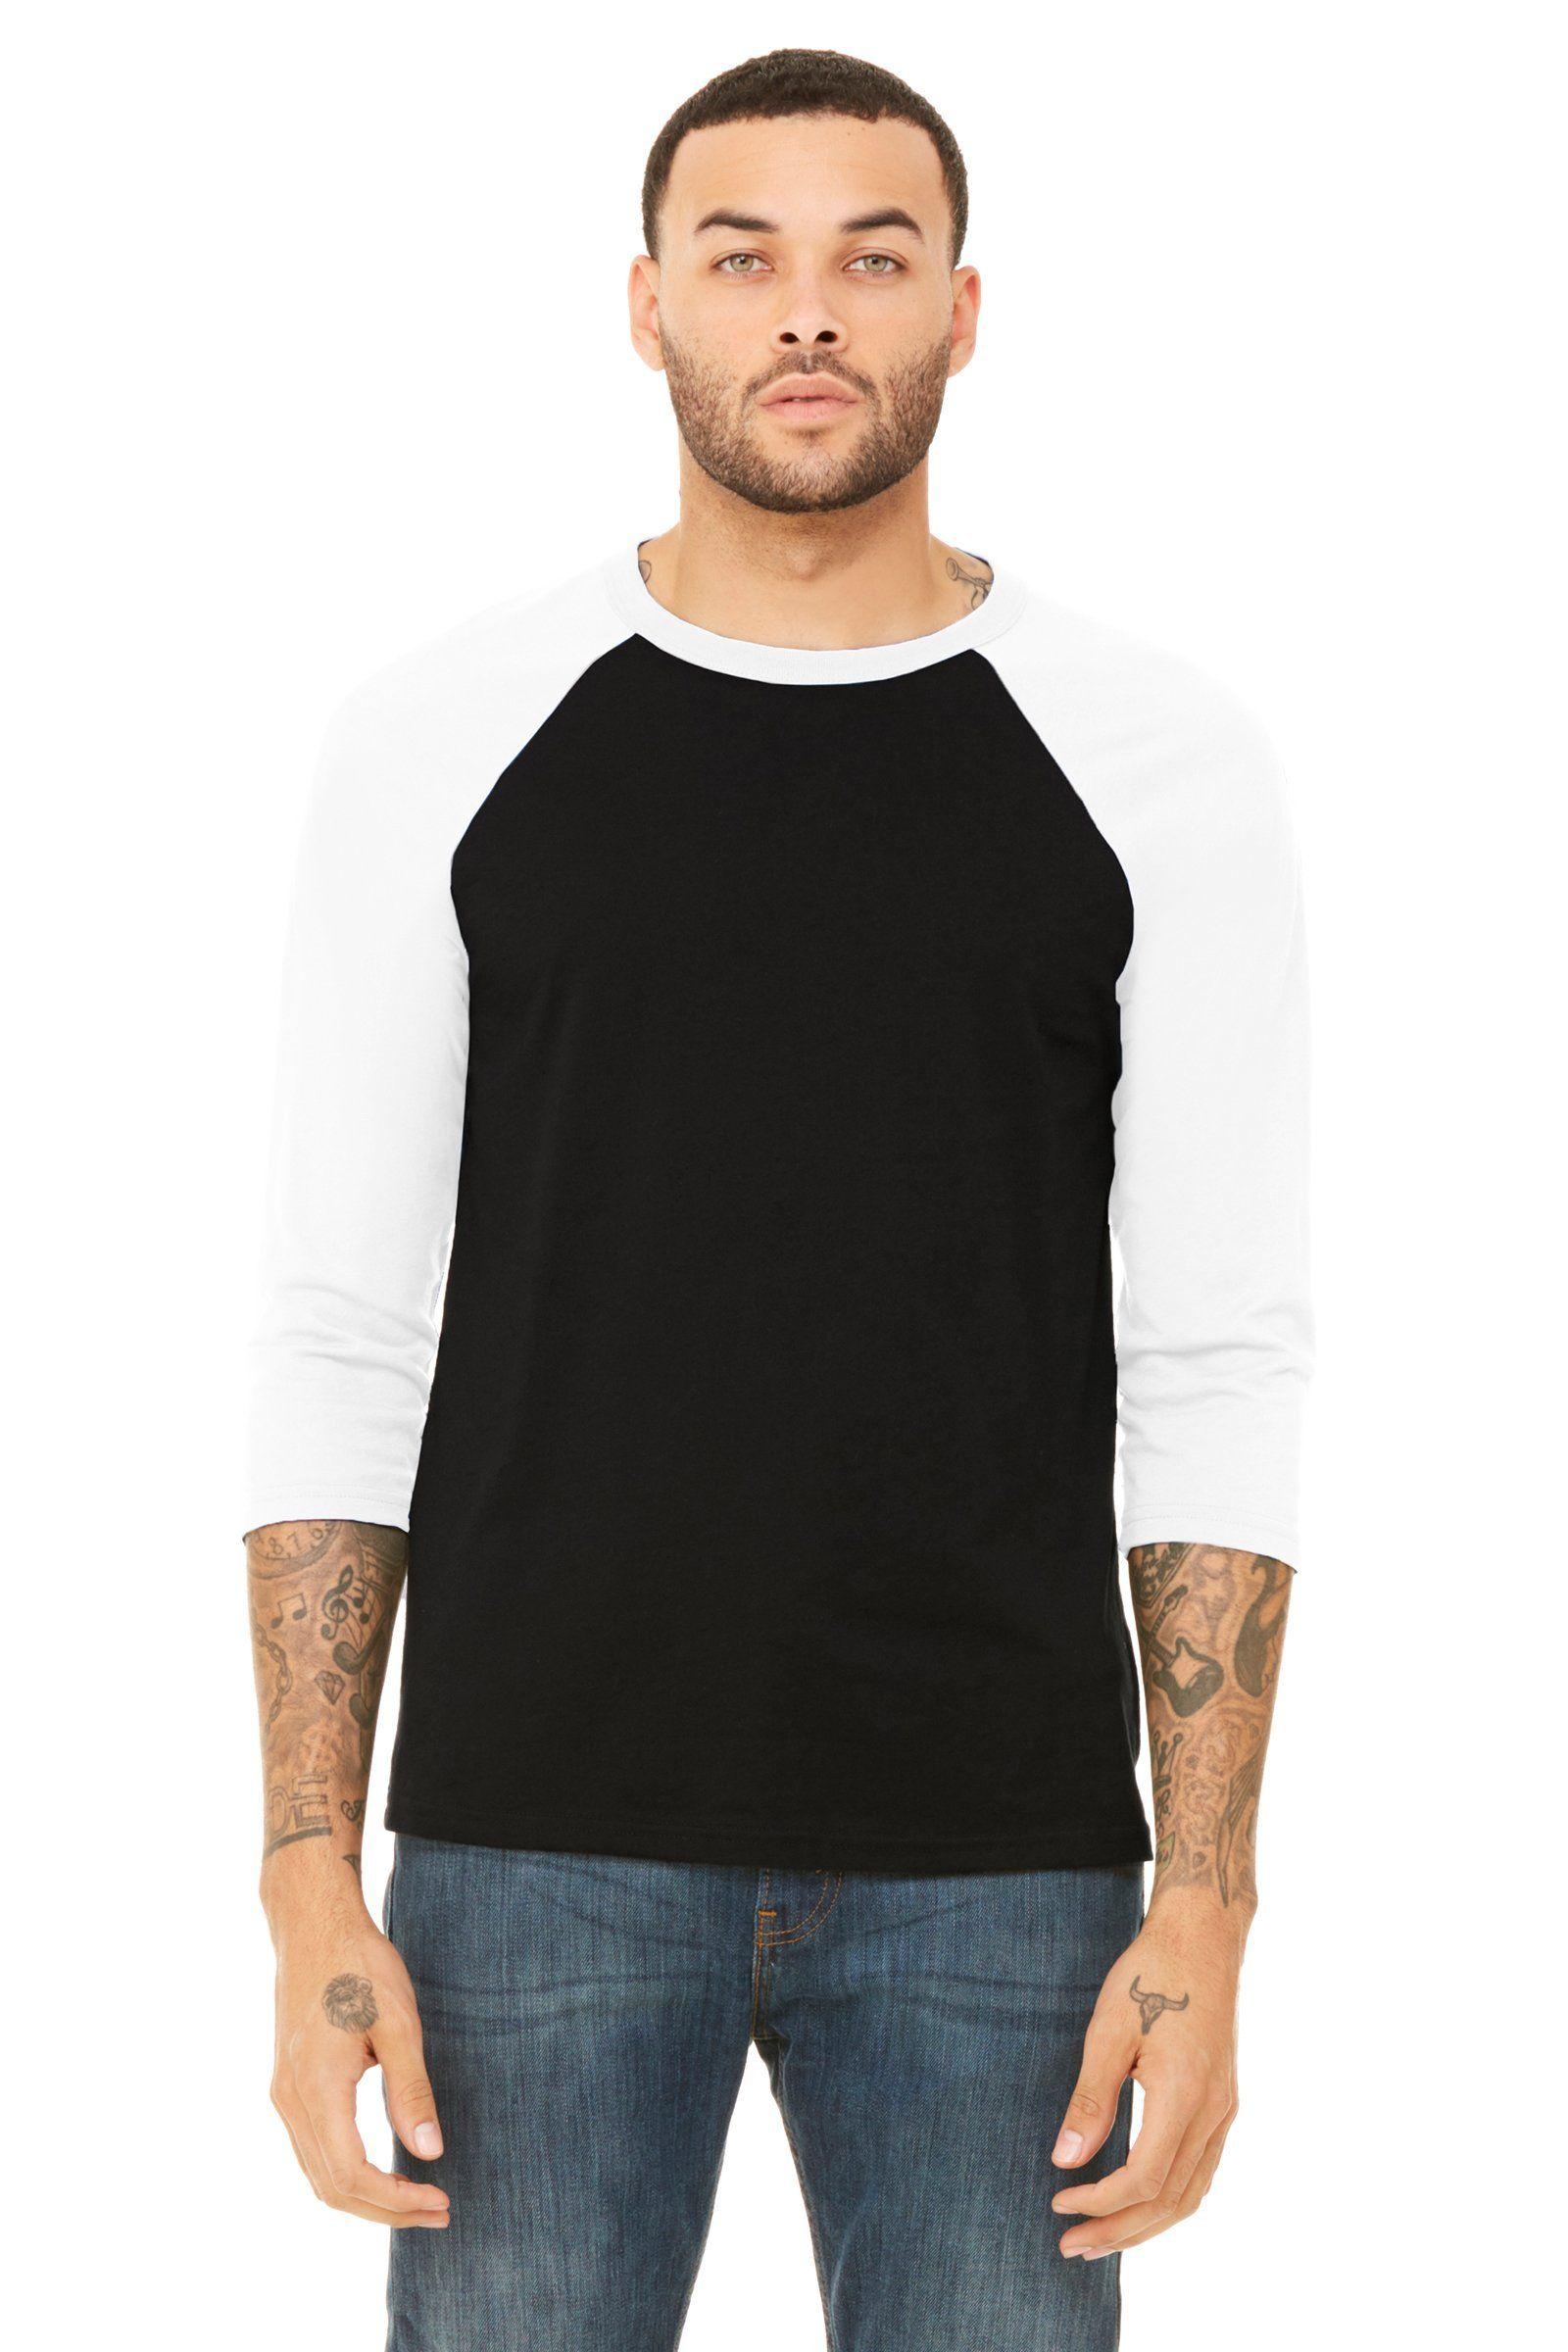 5f1814c4d Bella + Canvas Unisex 3/4-Sleeve Baseball T-Shirt 3200 Black/ White ...